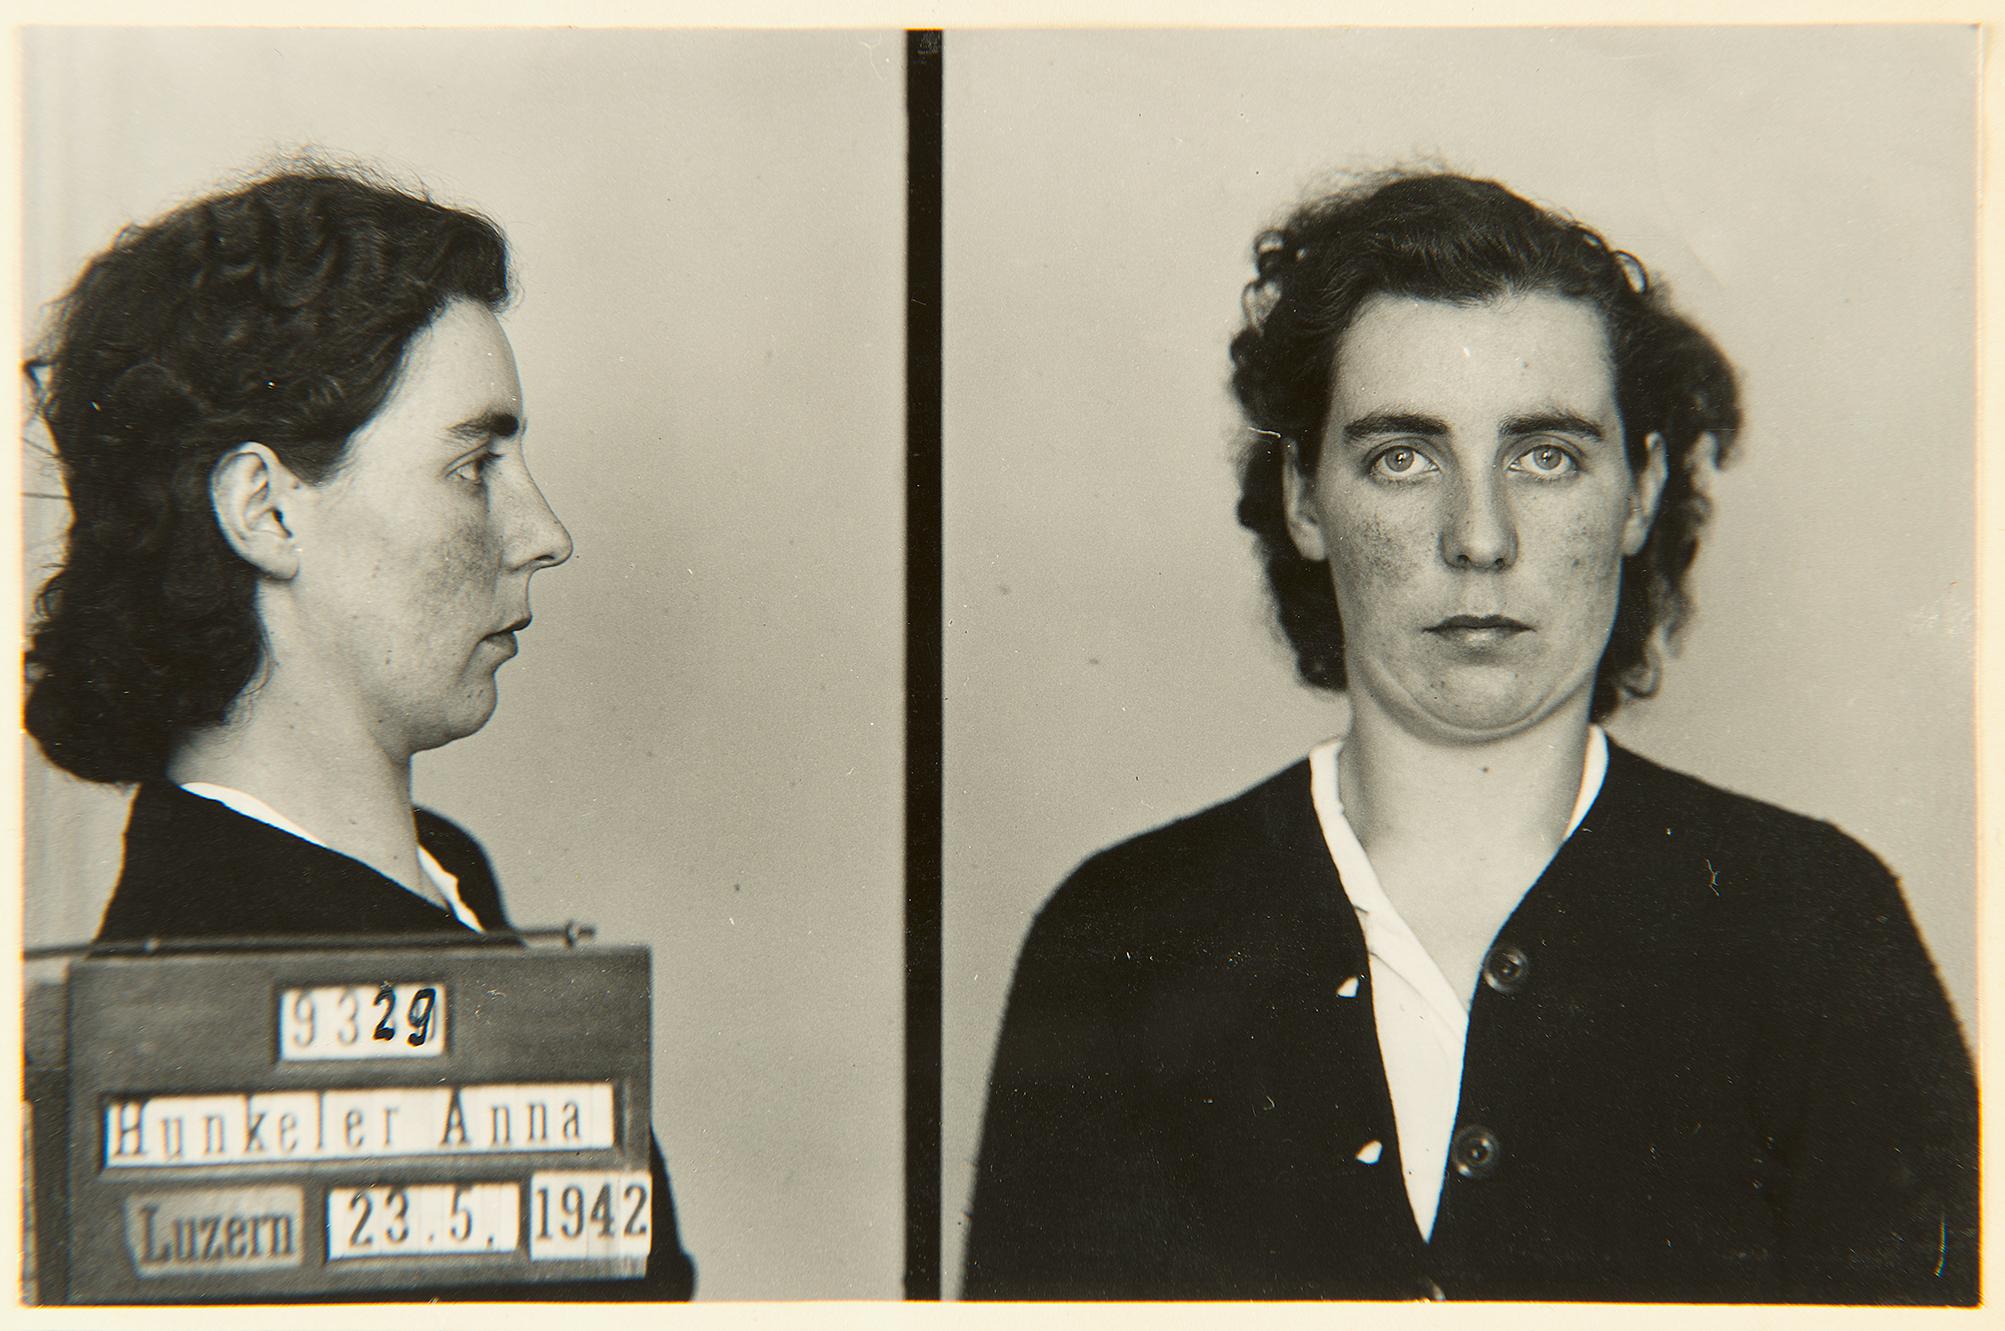 Anna Hunkeler-Bucheli, Fotografische Delinquenten-Sammlung, 23. Mai 1942